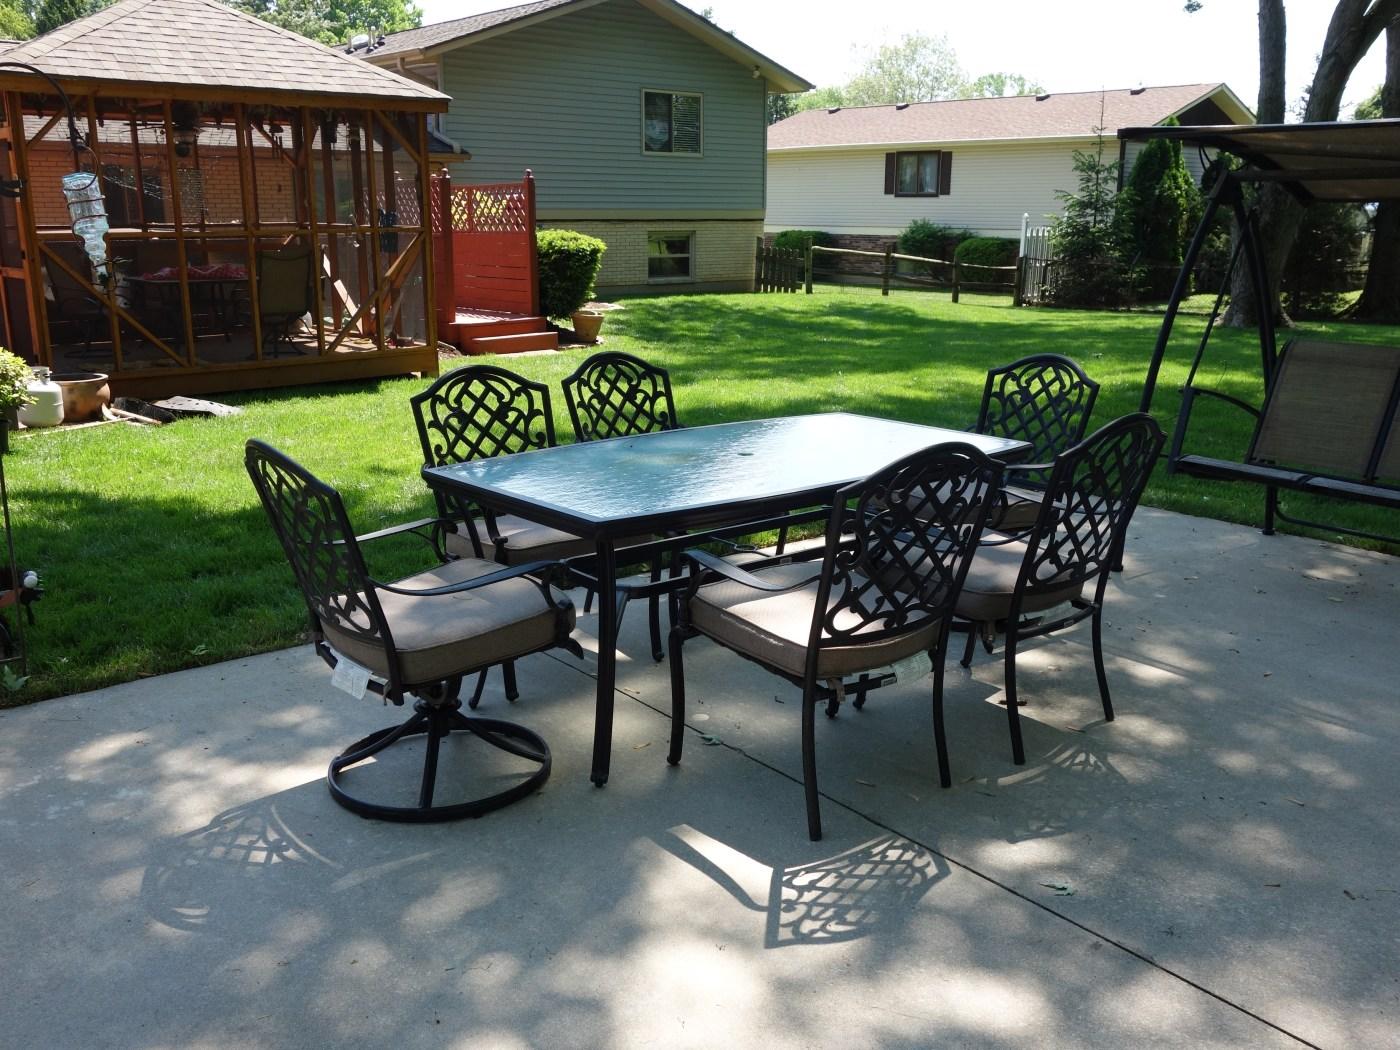 Martha Stewart Living Patio Glass Top Table & Six Chairs ... on Martha Stewart 6 Piece Patio Set id=35272